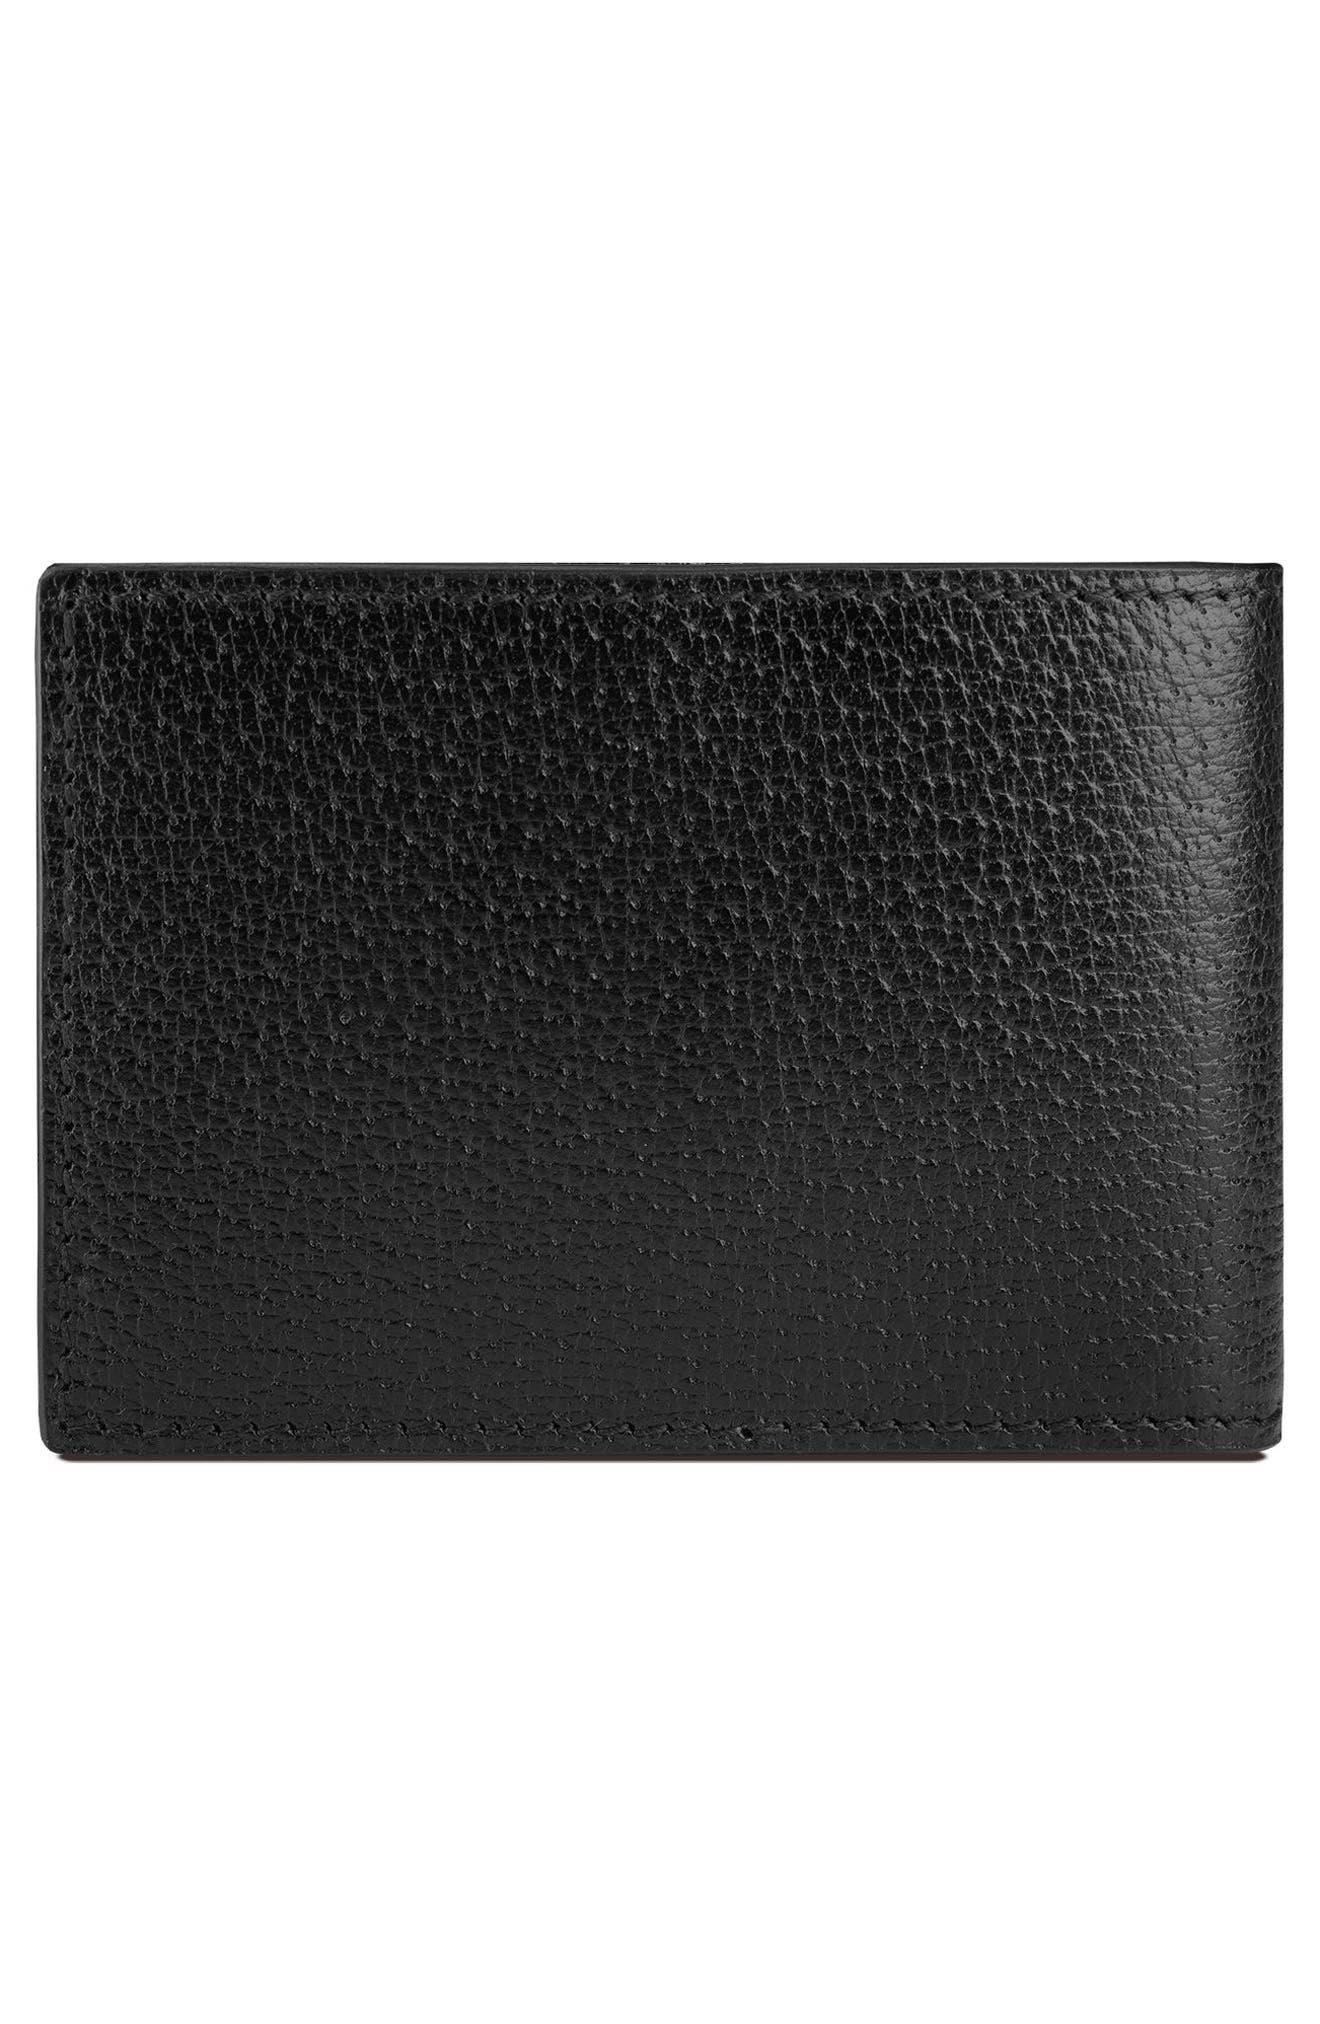 Marmont Leather Wallet,                             Alternate thumbnail 2, color,                             Black